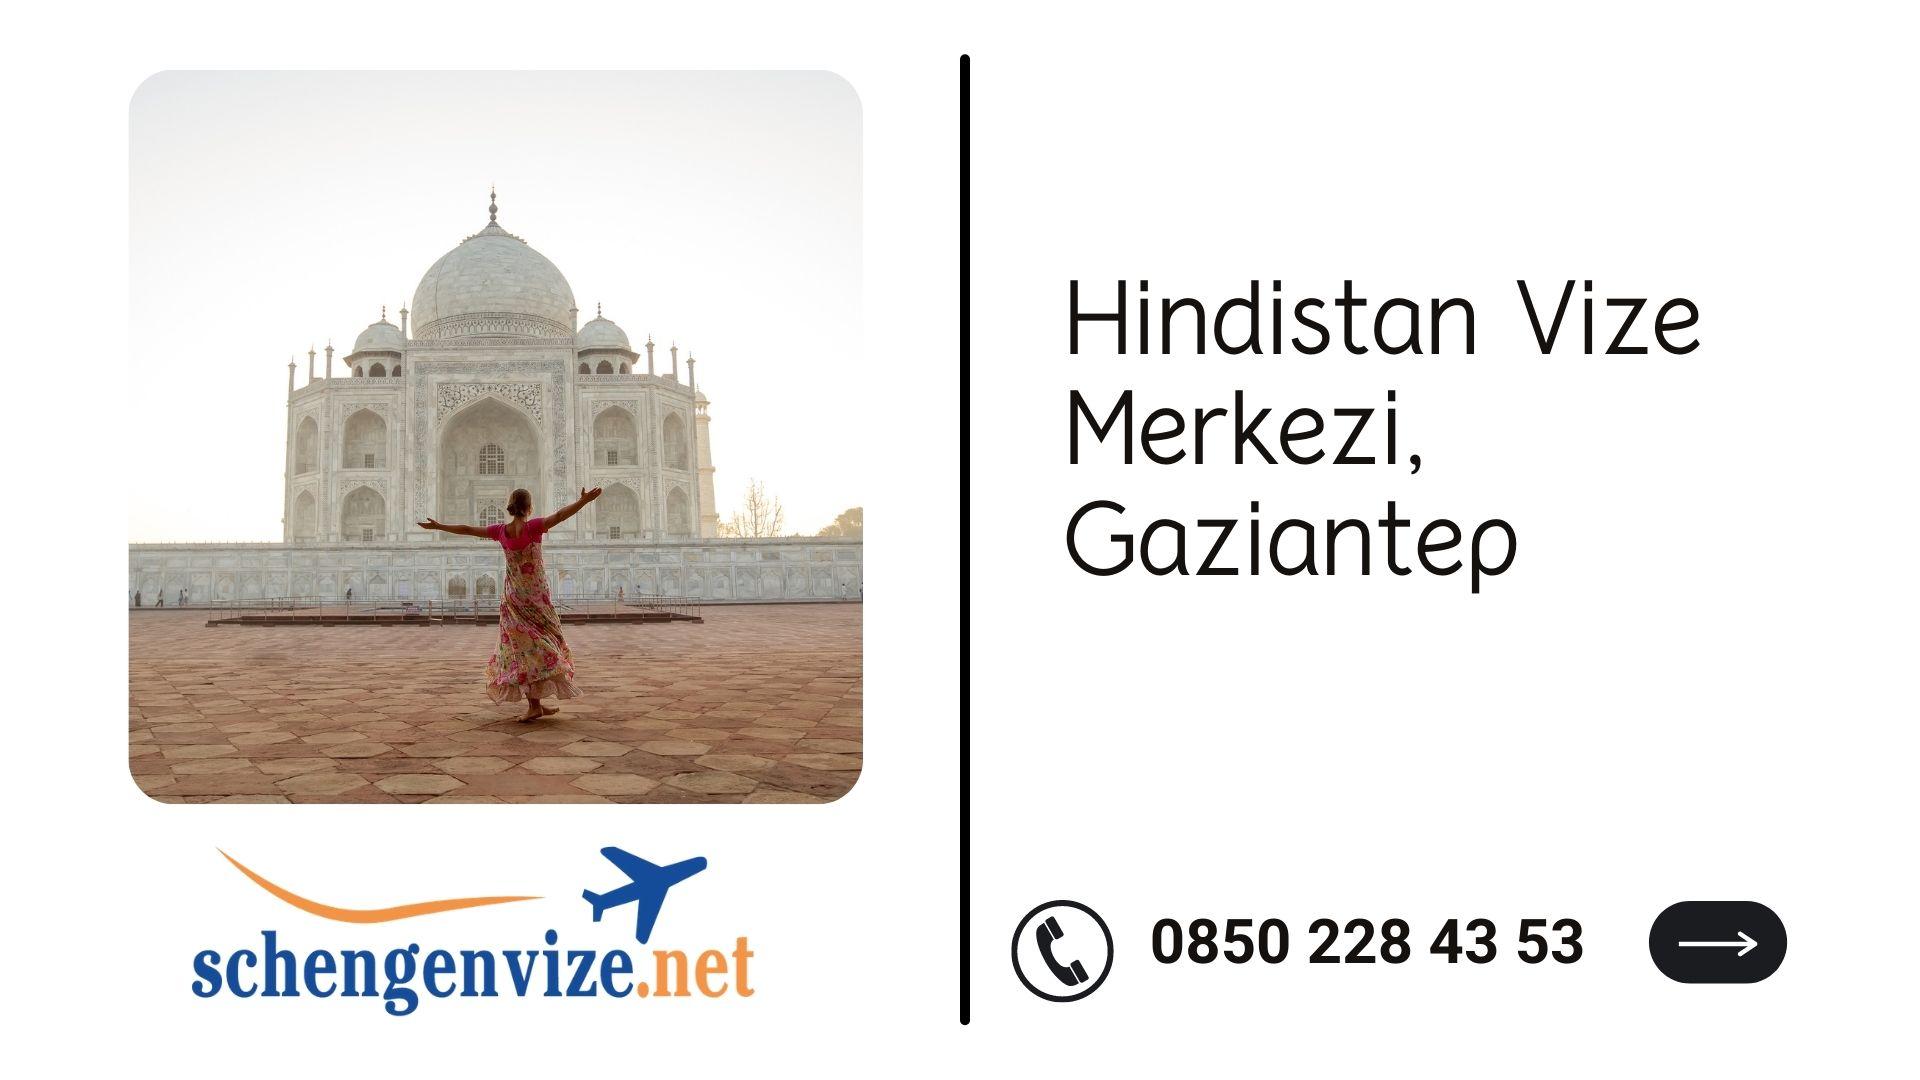 Hindistan Vize Merkezi, Gaziantep